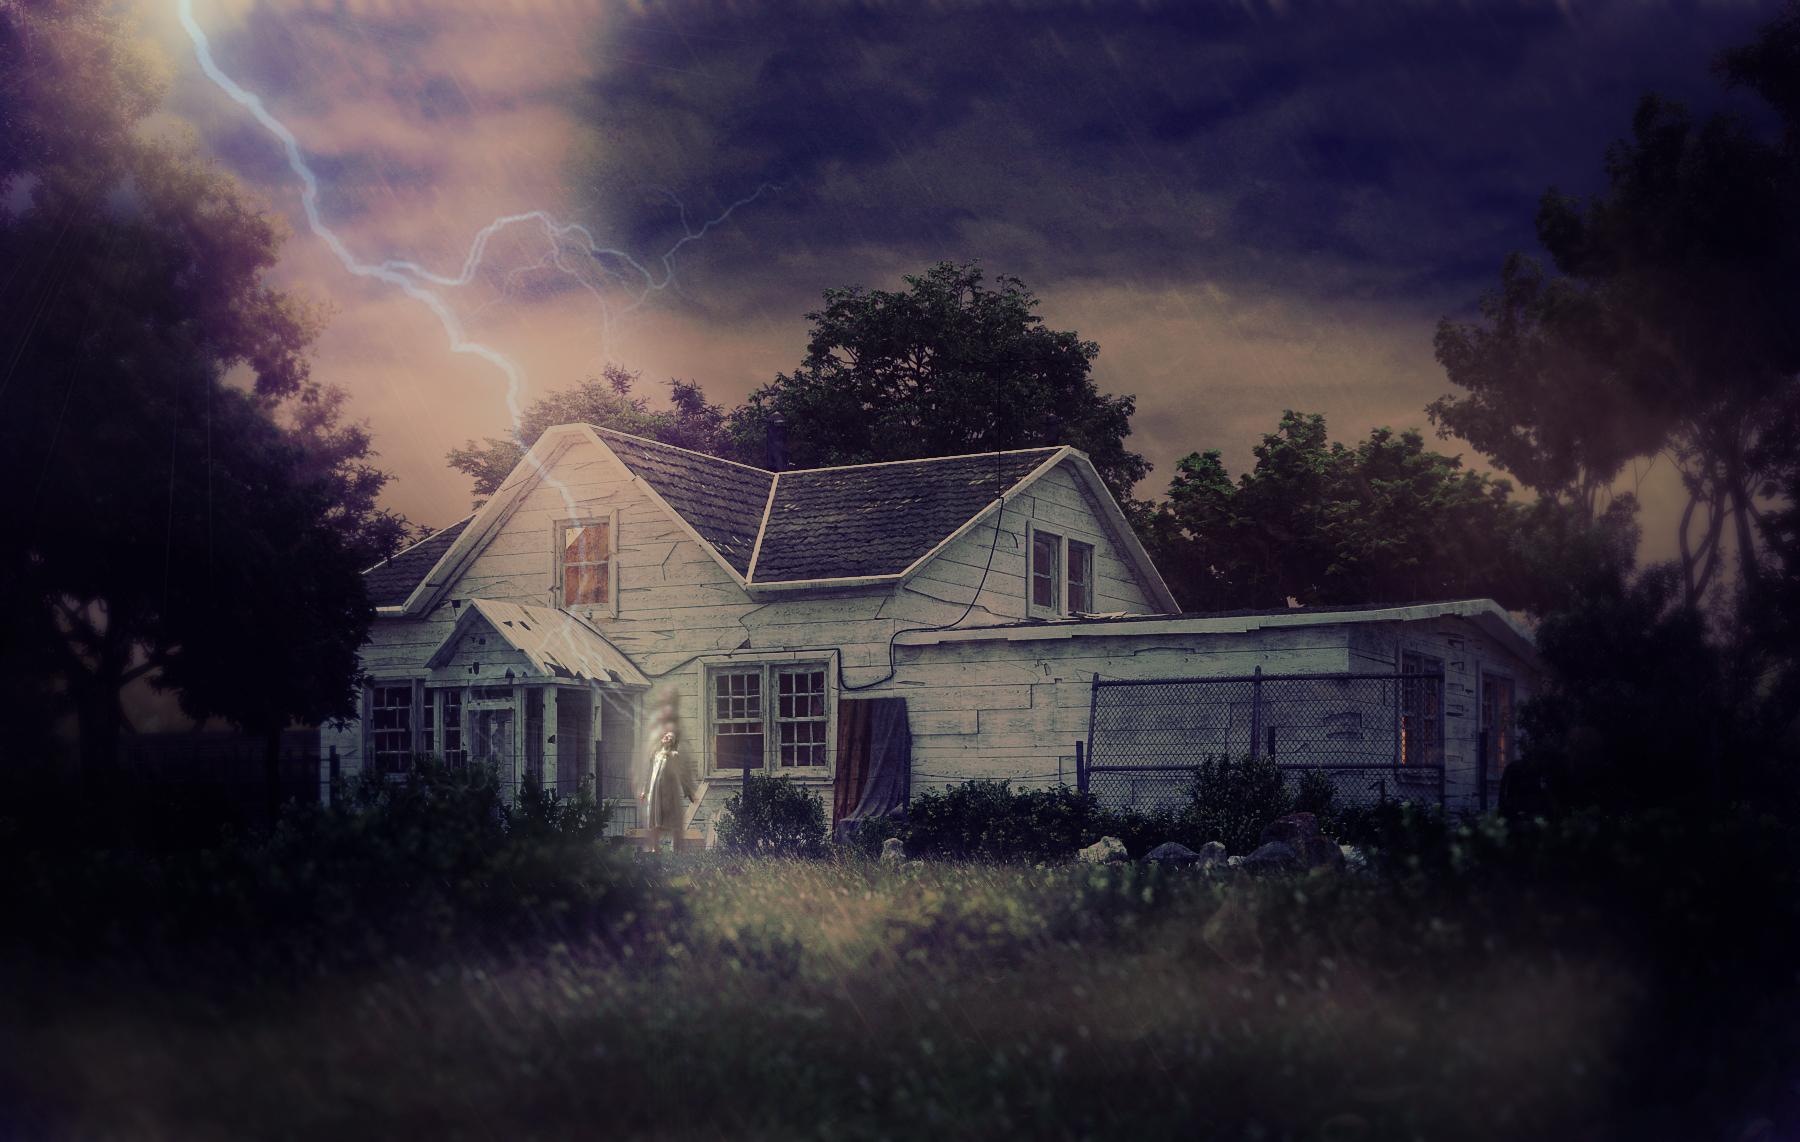 horror-story03-nightF by pitposum